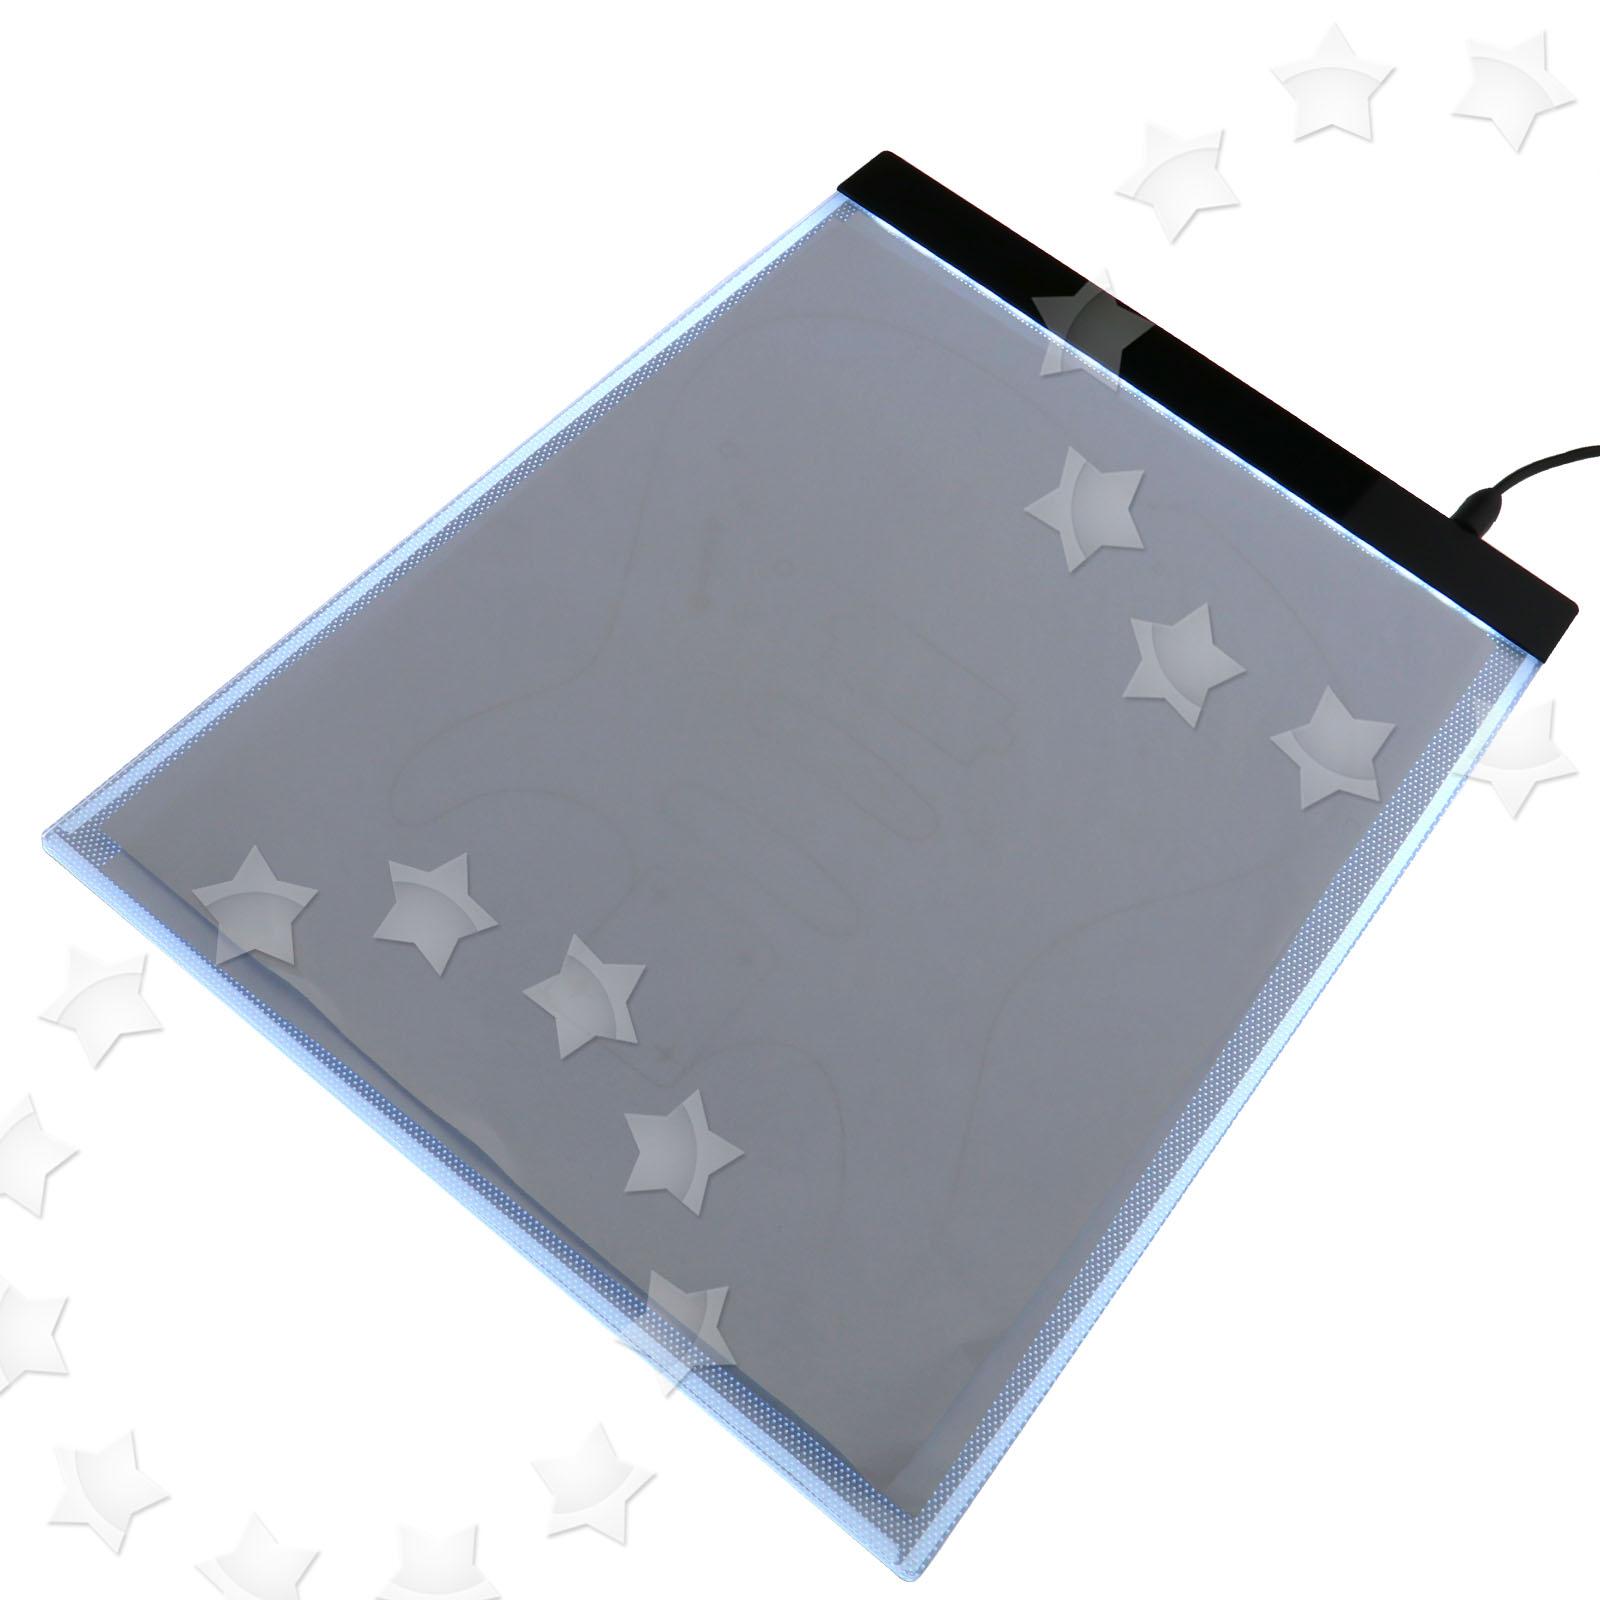 Craft light box for tracing - A4 Led Ultra Slim Art Craft Drawing Tracing Tattoo Light Box Pad Board Lightbox